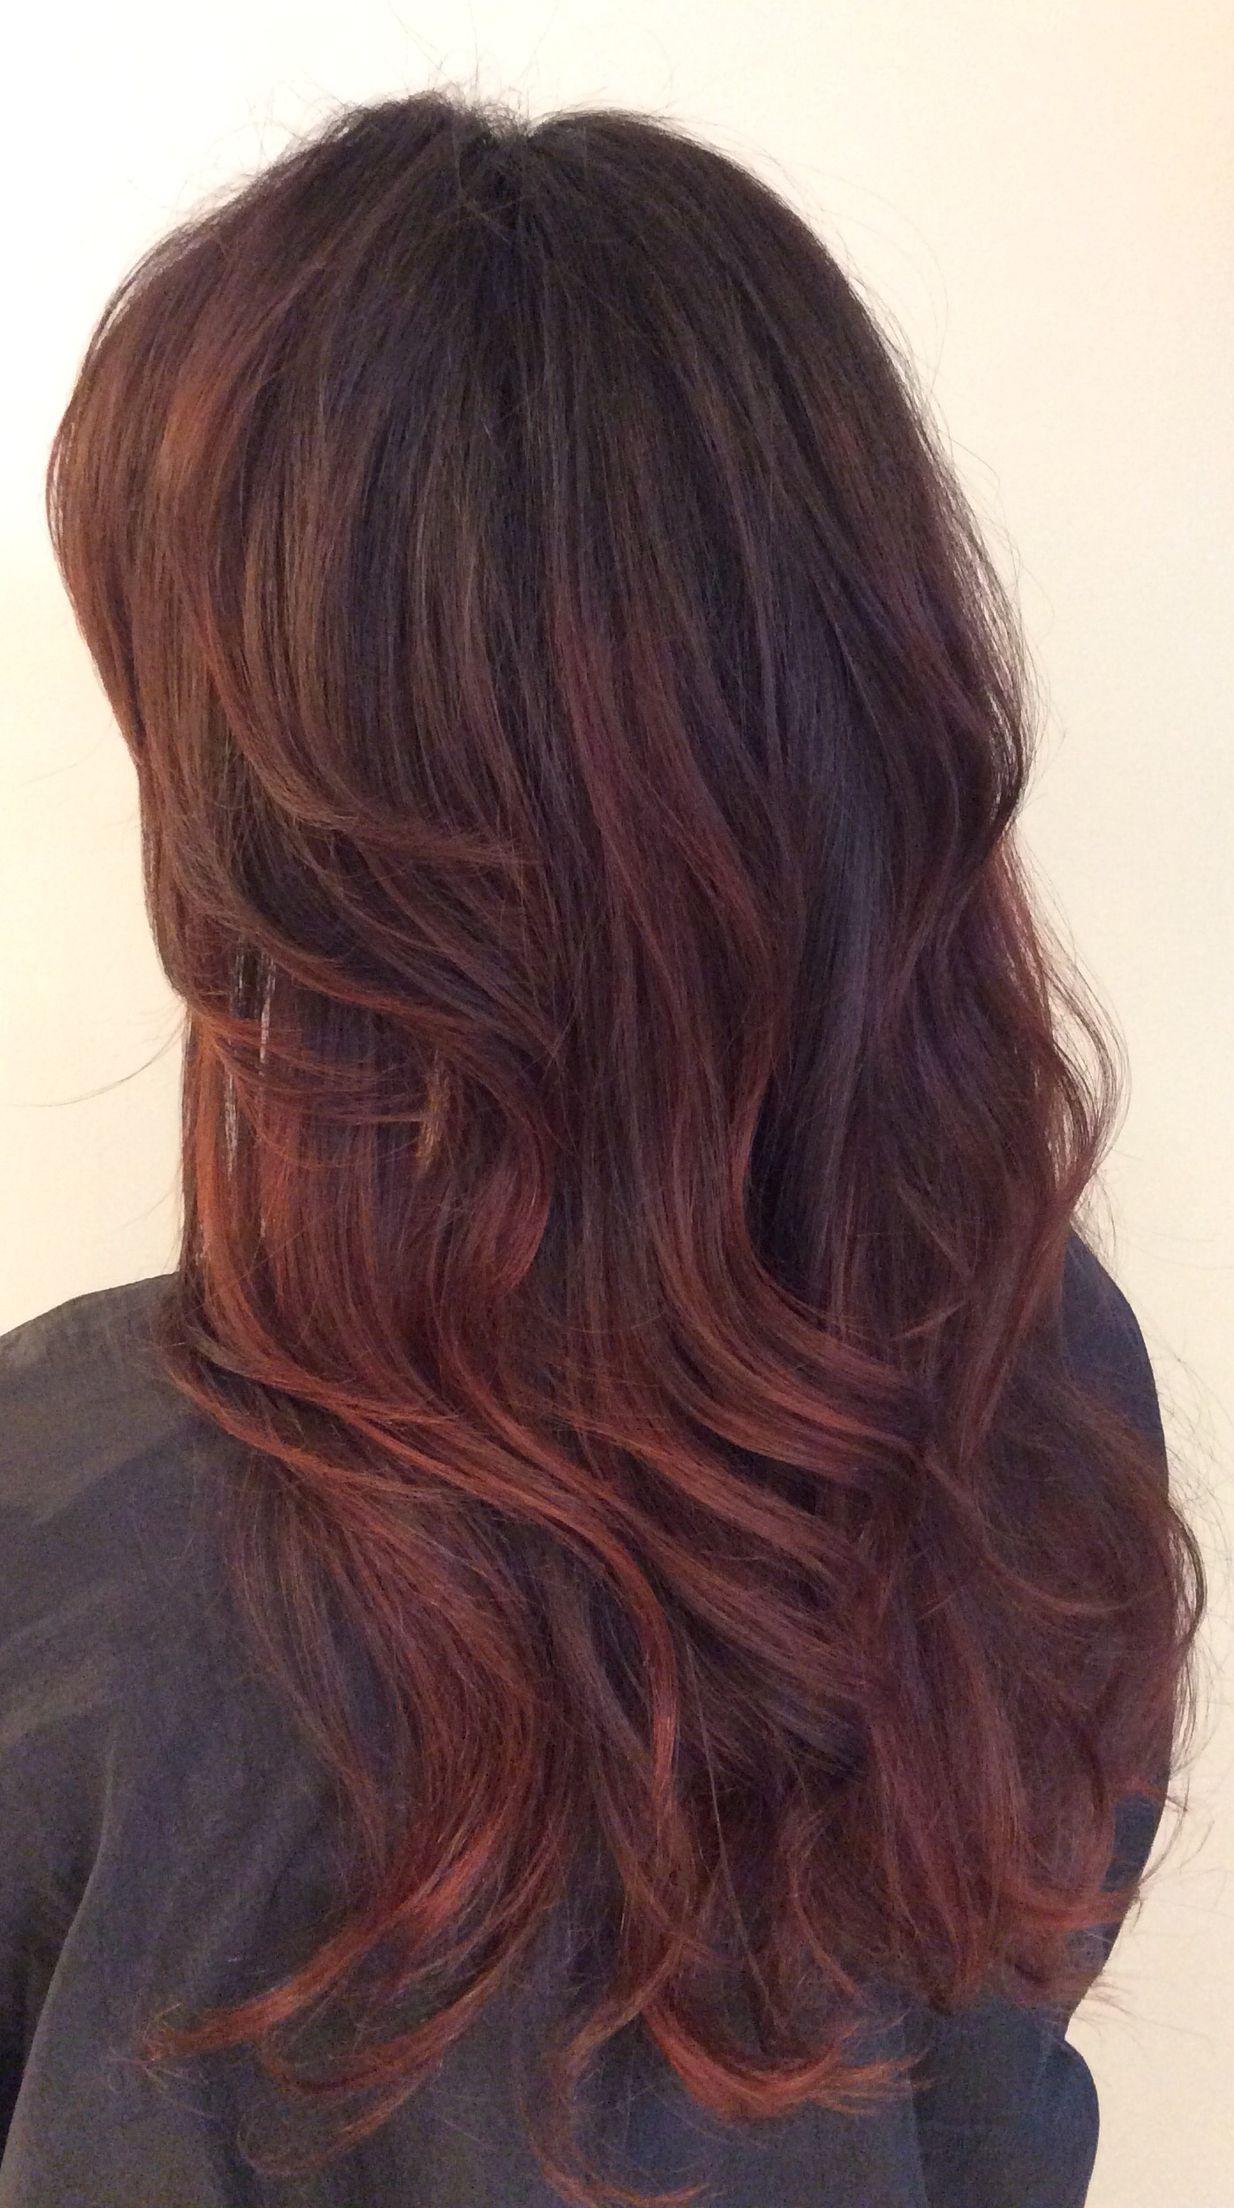 Brunette Hair With Dark Red Balayage Hair Styles Balayage Red Balayage